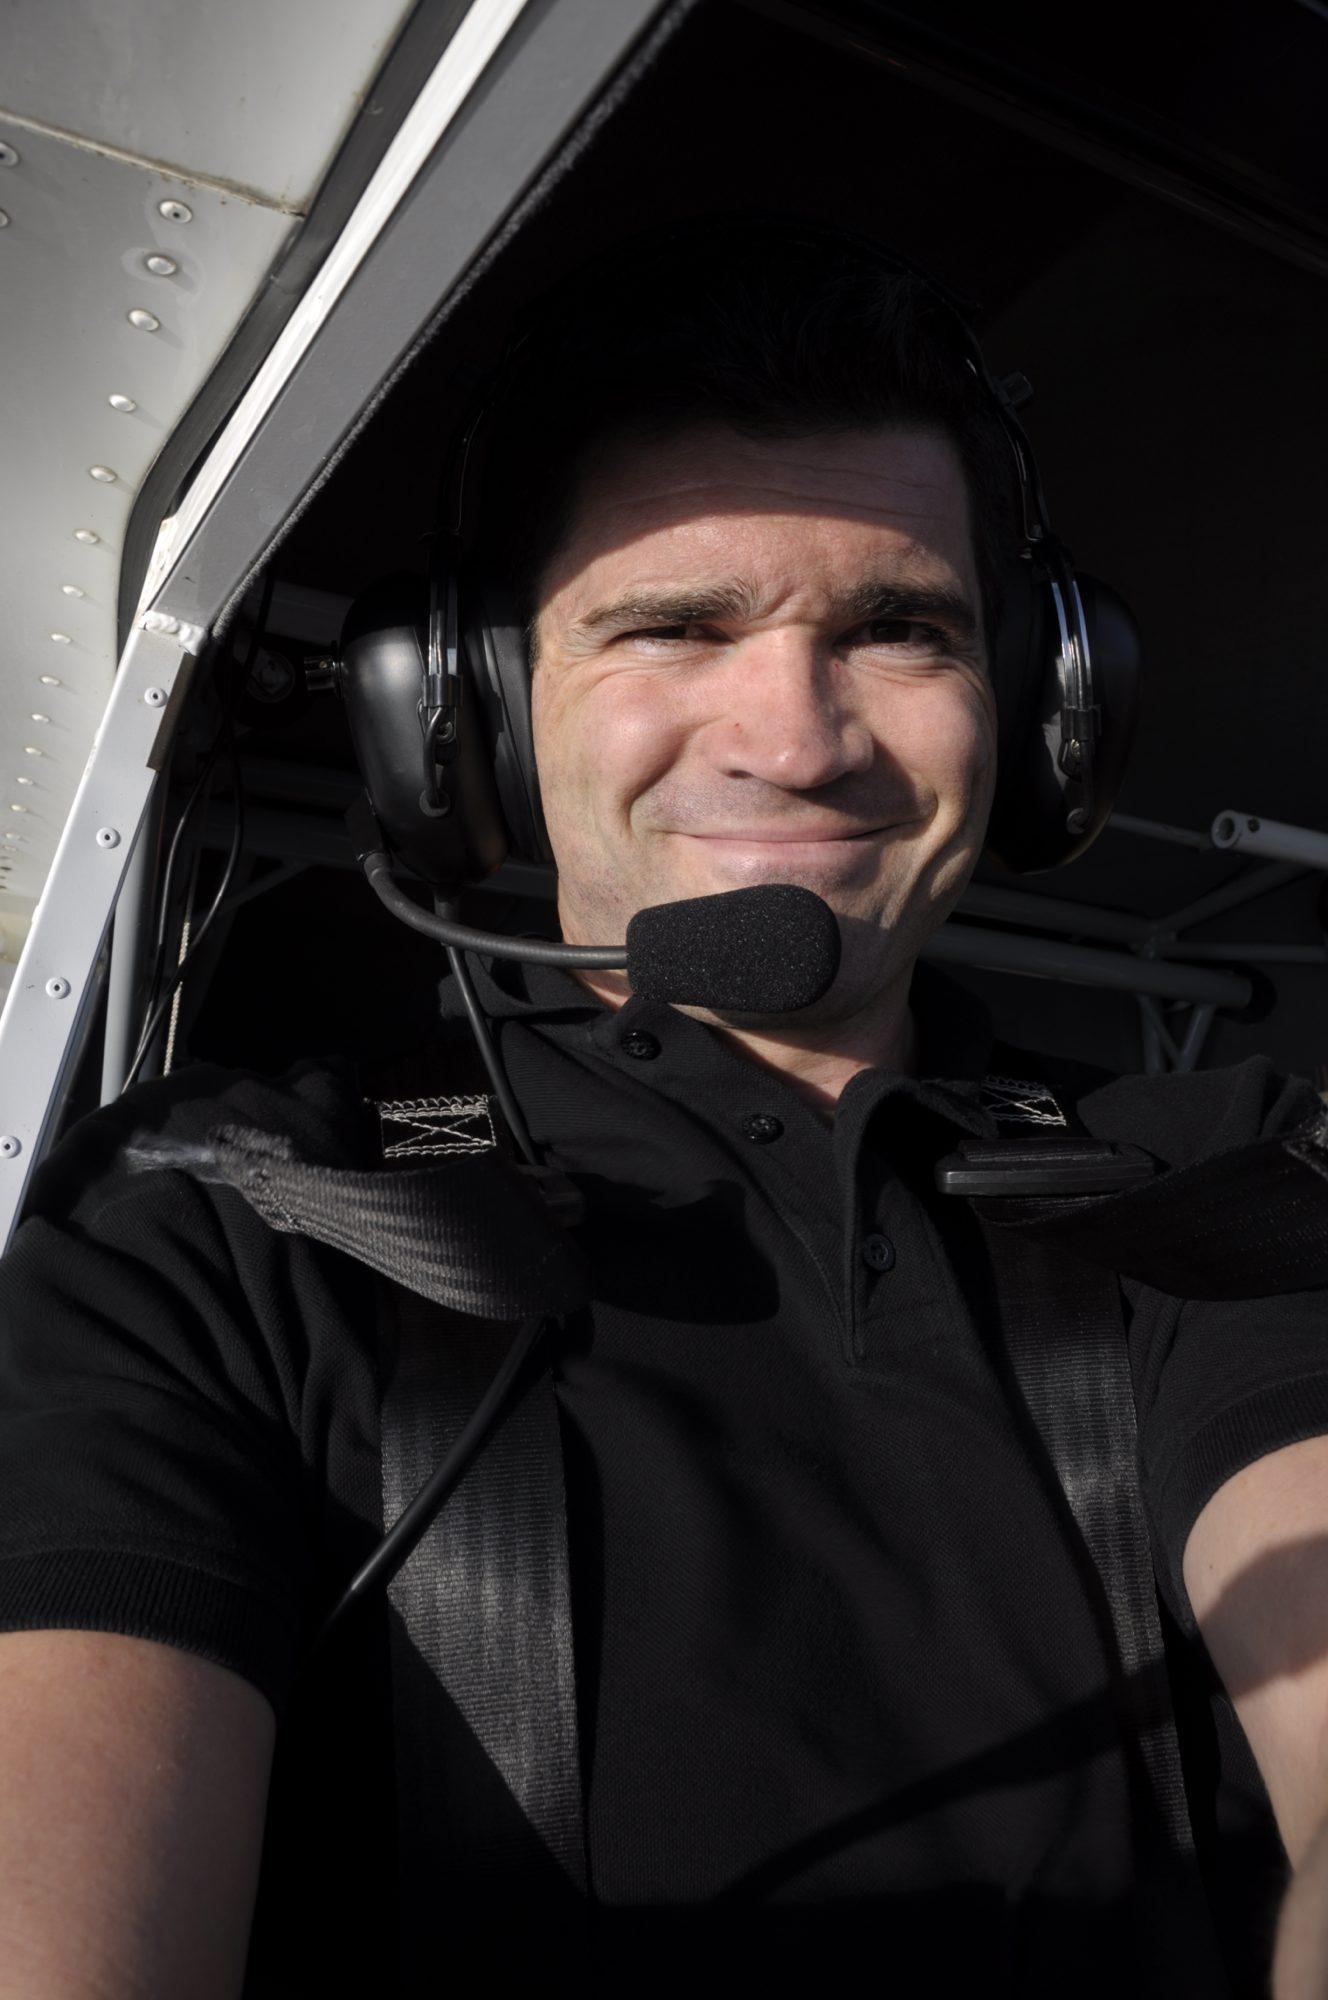 Flying high! Selbstporträt über Mittweida